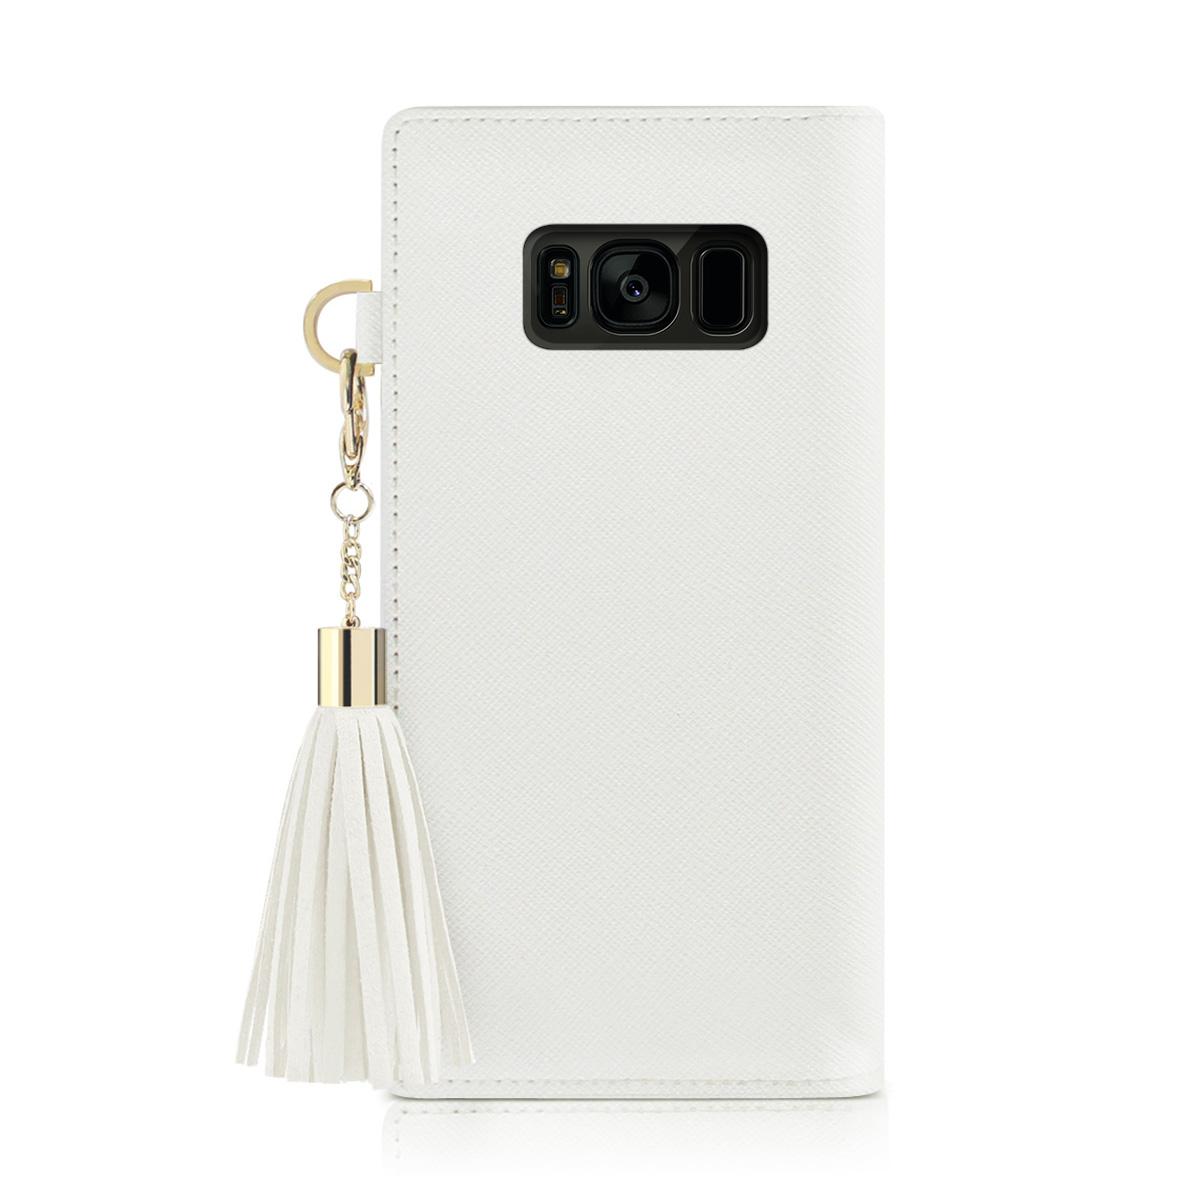 Galaxy S10 ケース 手帳型 DreamPlus Tassel Jacket(ドリームプラス タッセルジャケット) ギャラクシー カバー タッセル付き Galaxy S9 Galaxy S9+ Galaxy S8 Galaxy S8+